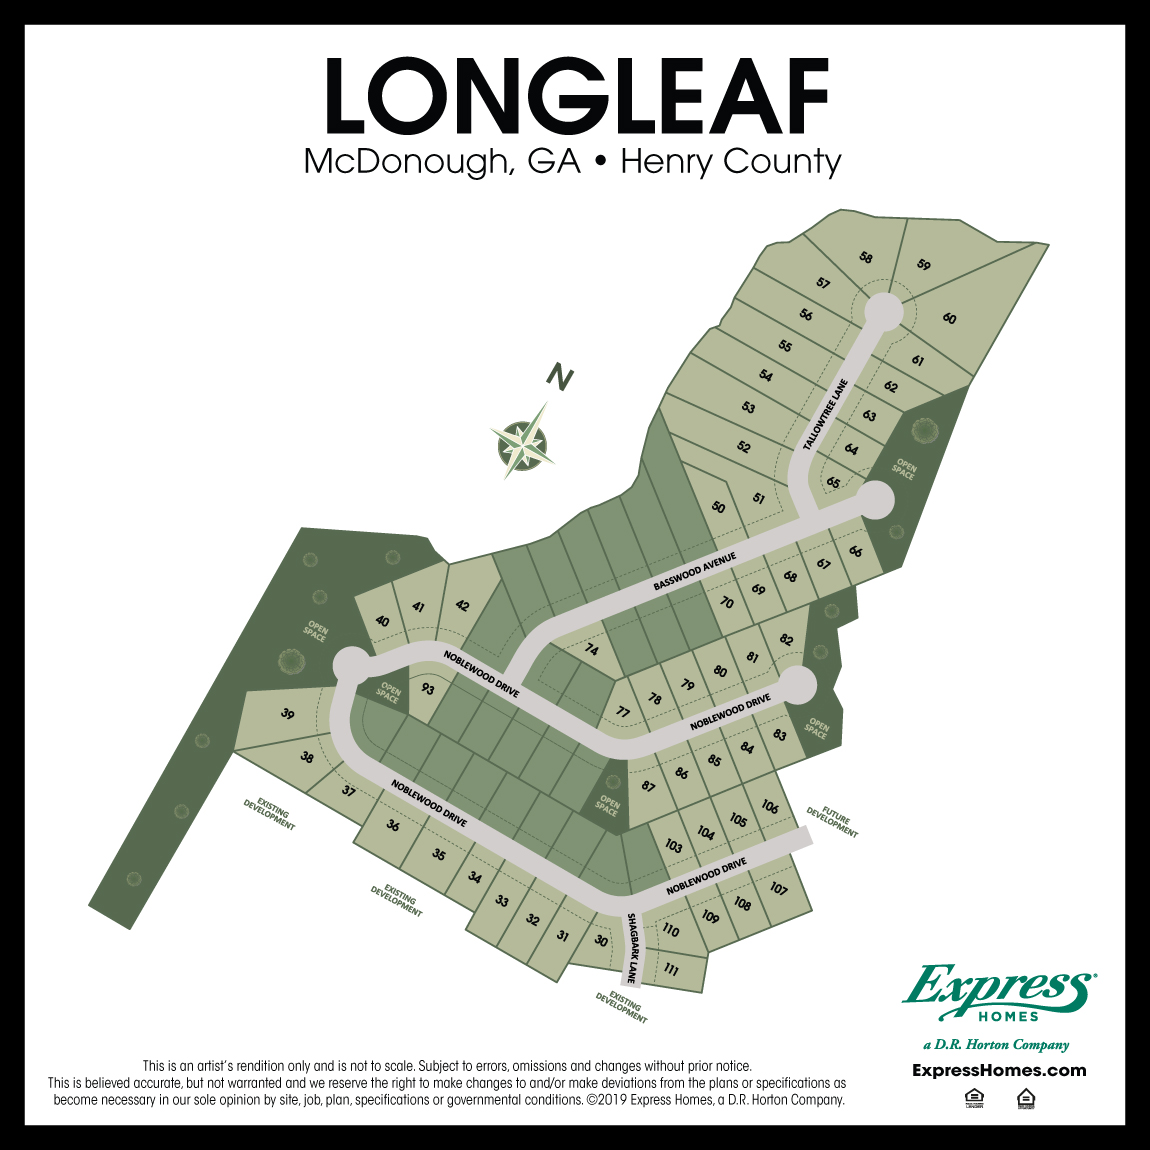 New Homes In Longleaf Mcdonough Ga D R Horton